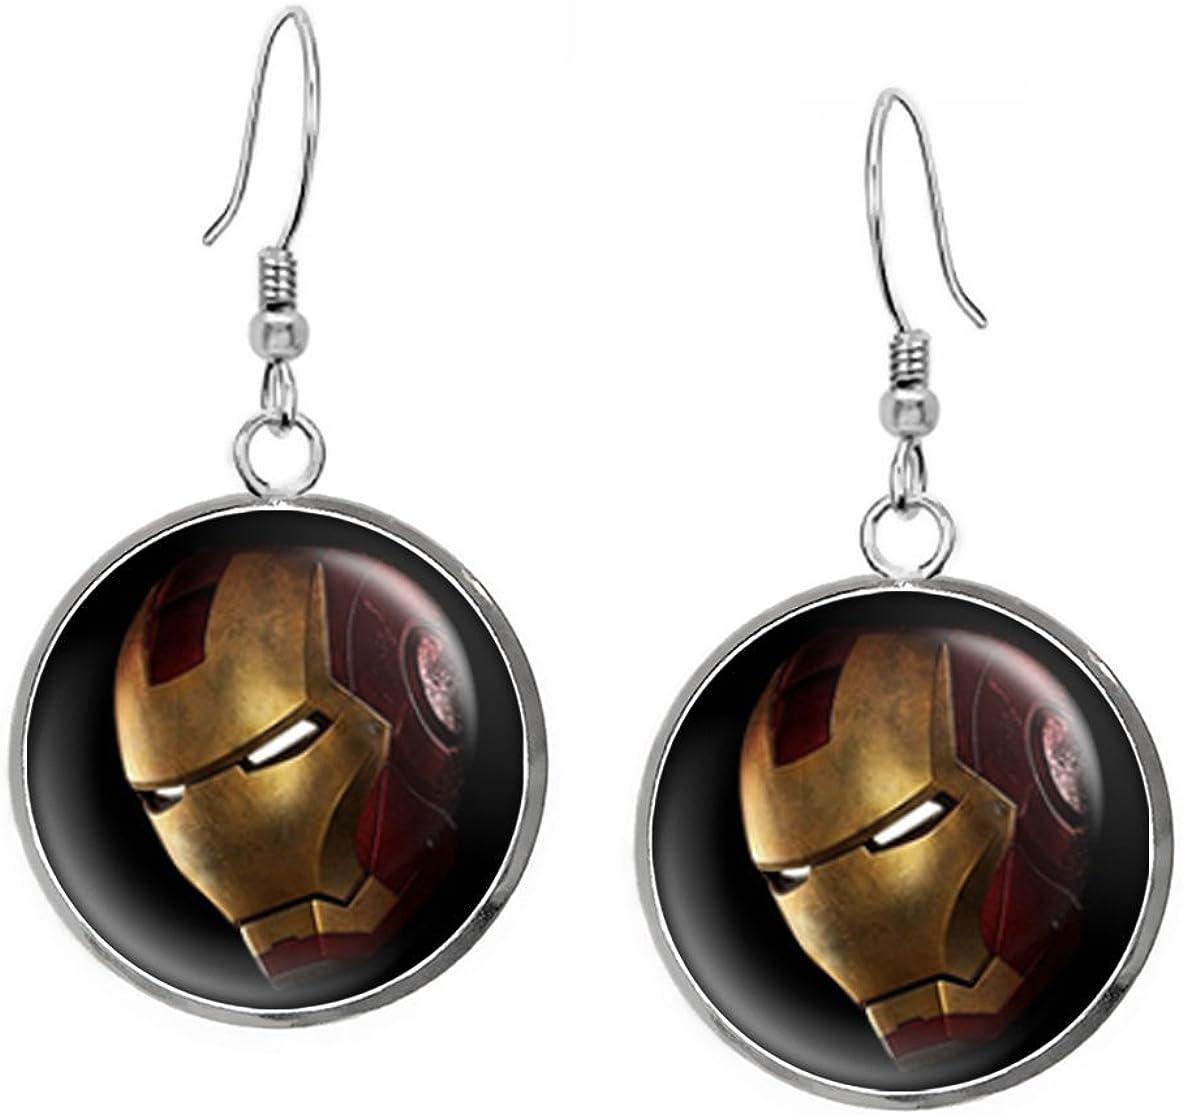 Incredible Hulk Radiation Necklace Iron Man Ironman Pendant Set Marvel Captain America Shield Superhero Jewelry Avengers Earrings